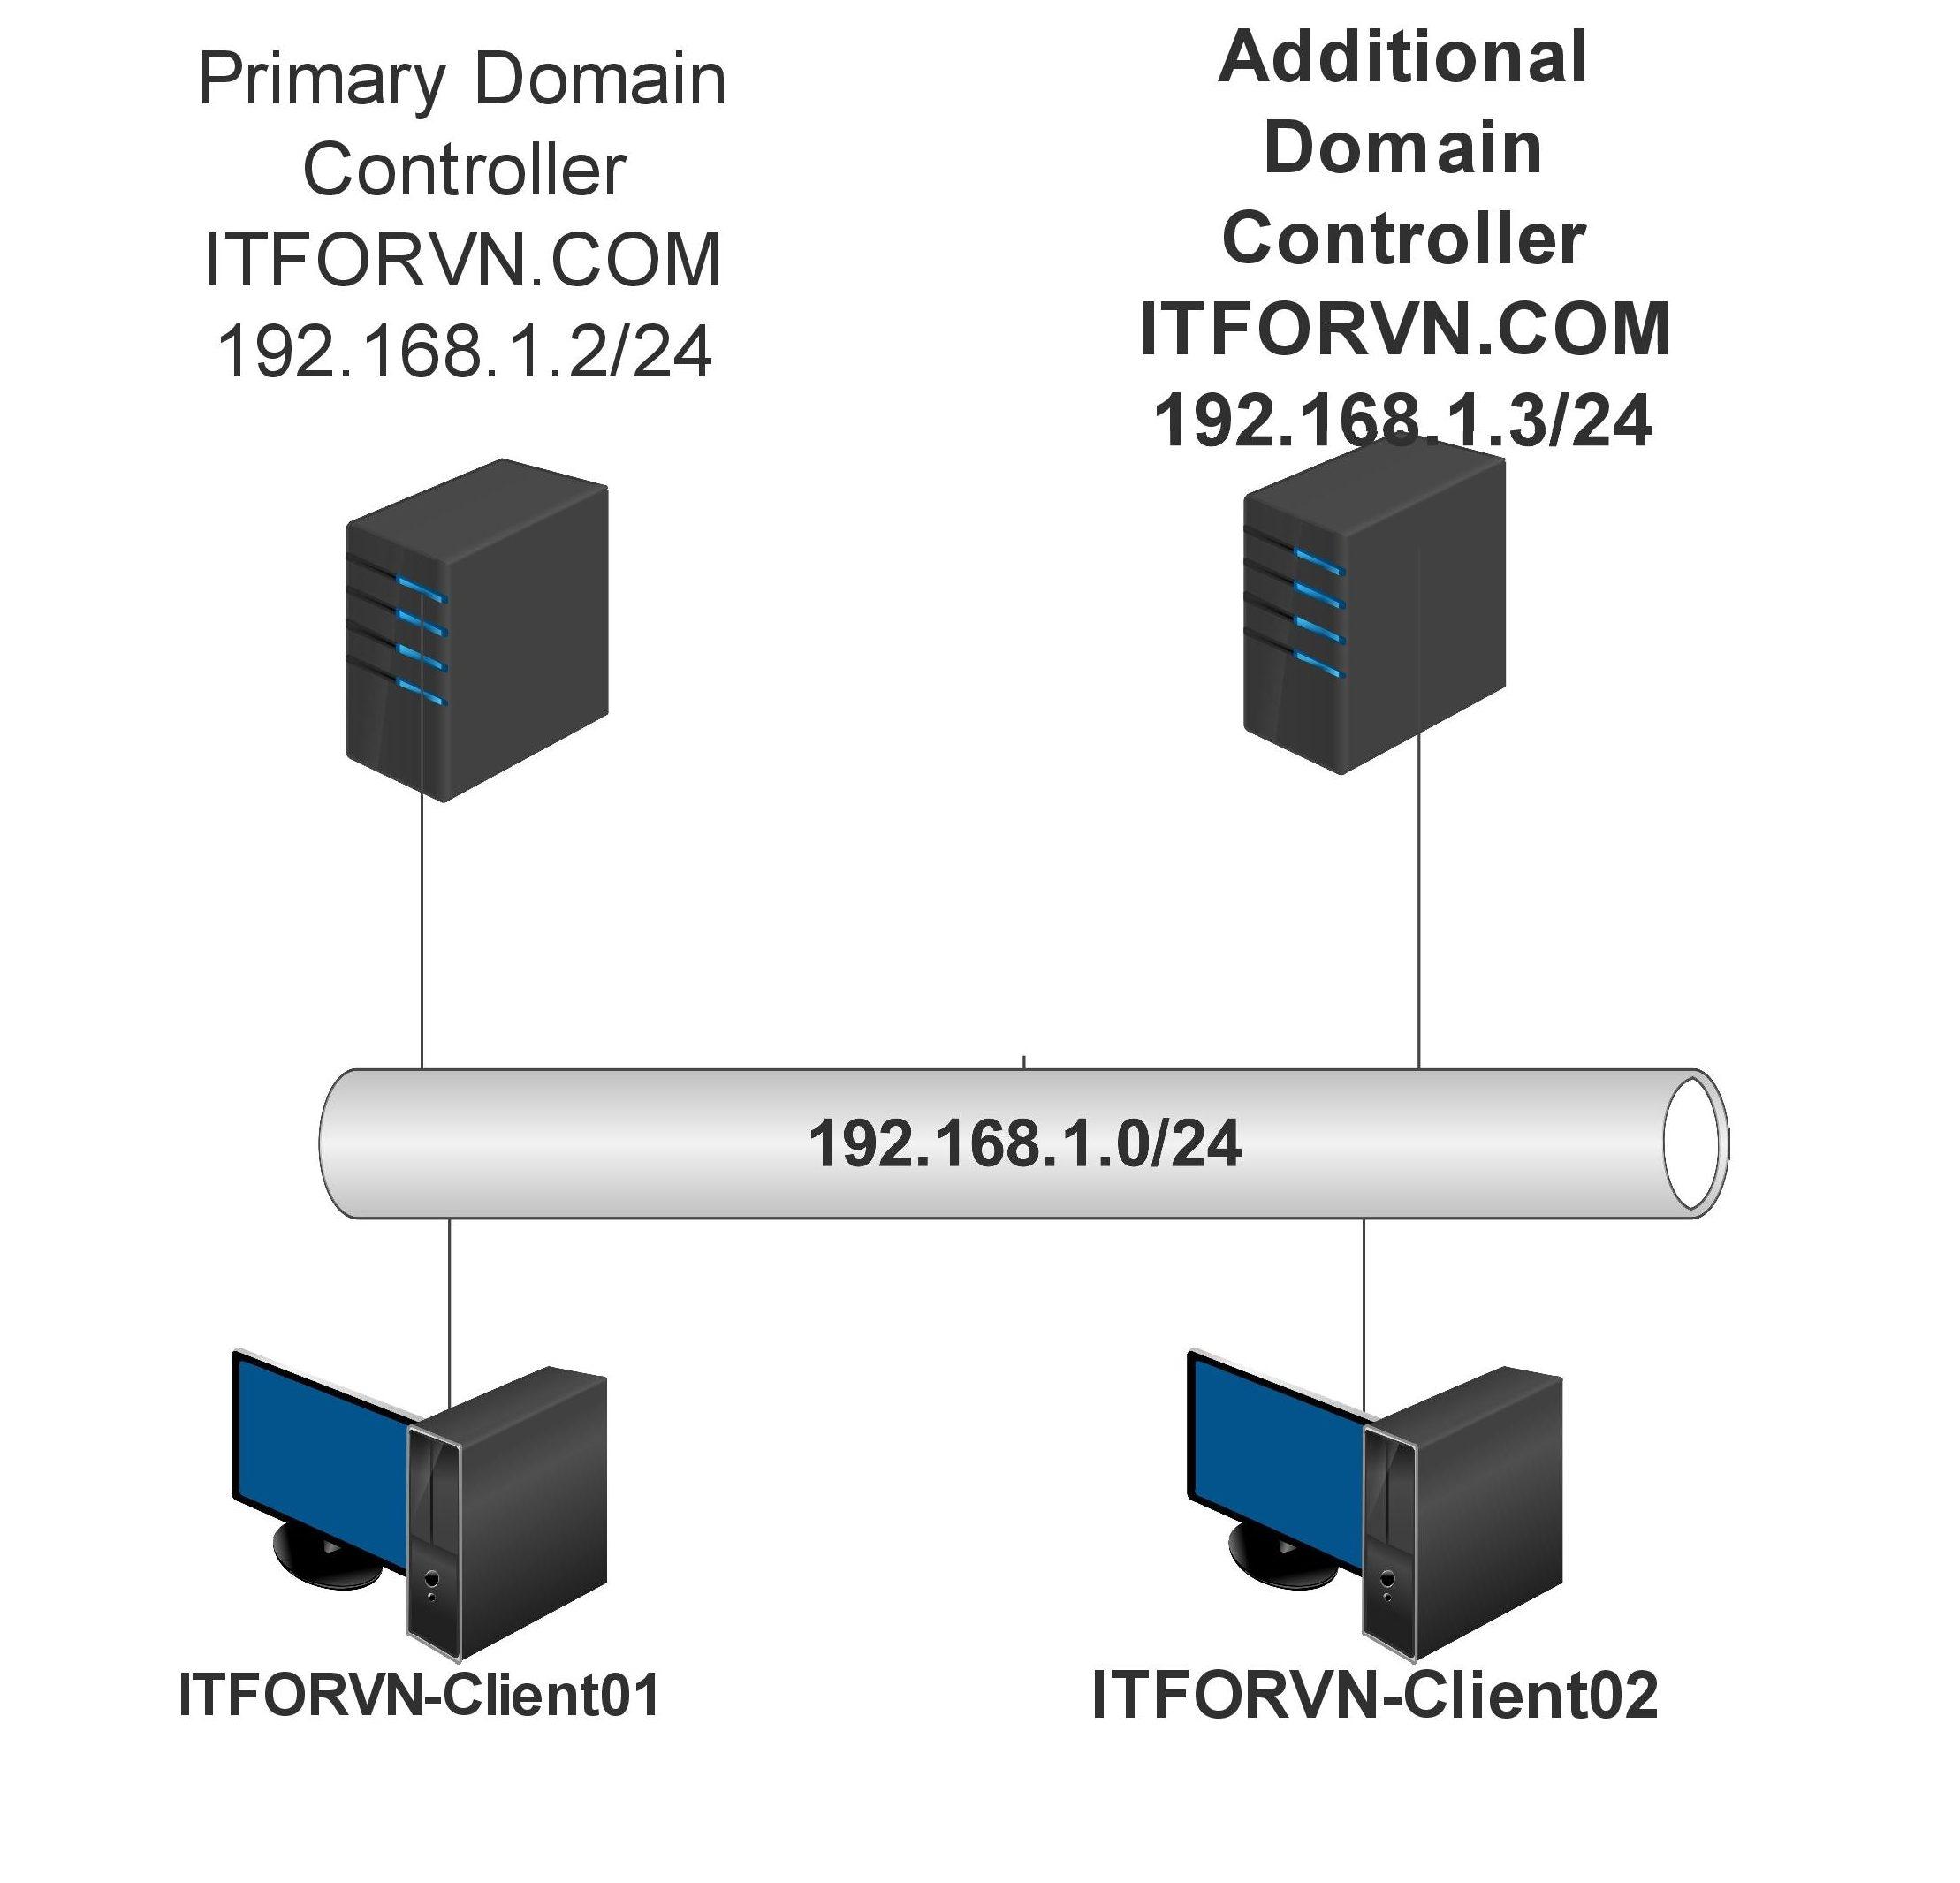 truonghop2 page 001 e1492131306951 - [Tự học MCSA MCSE 2016]-Lab 5- Cấu hình Additional Domain Controller trên Windows server 2016